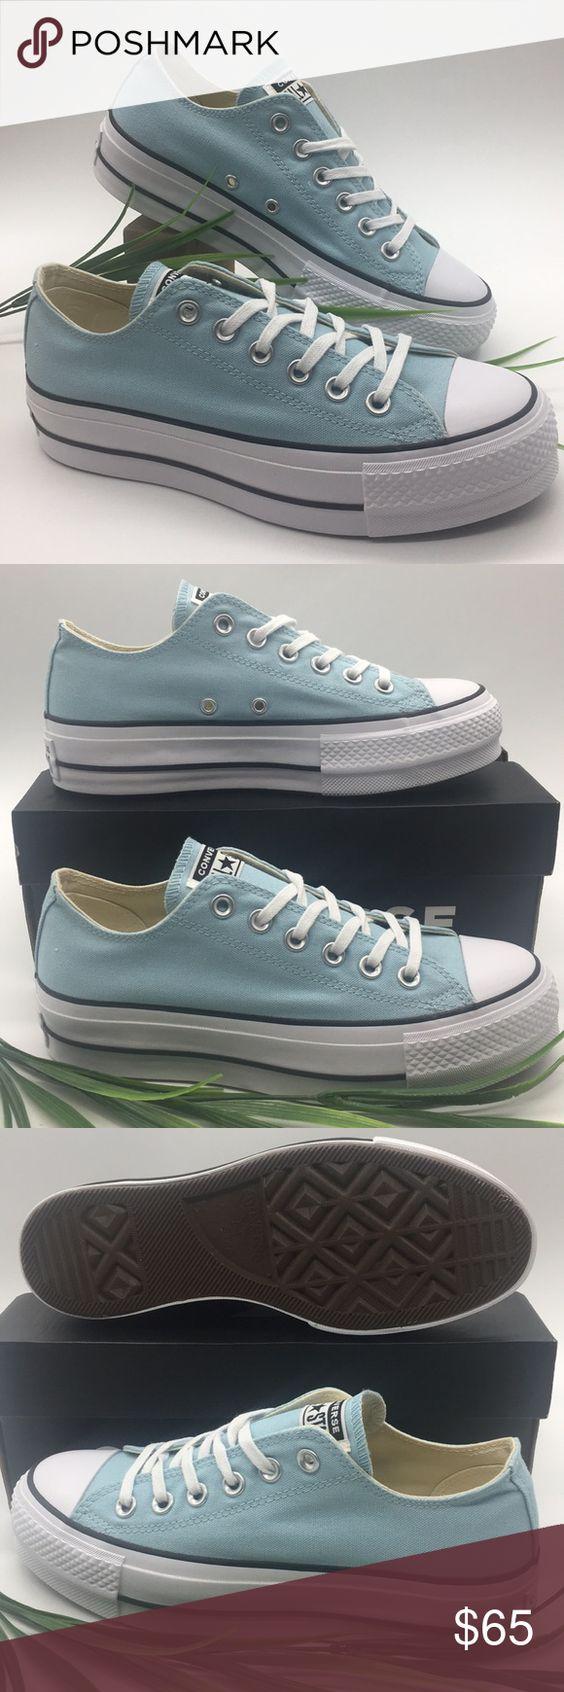 Converse Chuck Taylor All Star Lift OX Womens Shoes Ocean-White-Black 560687C